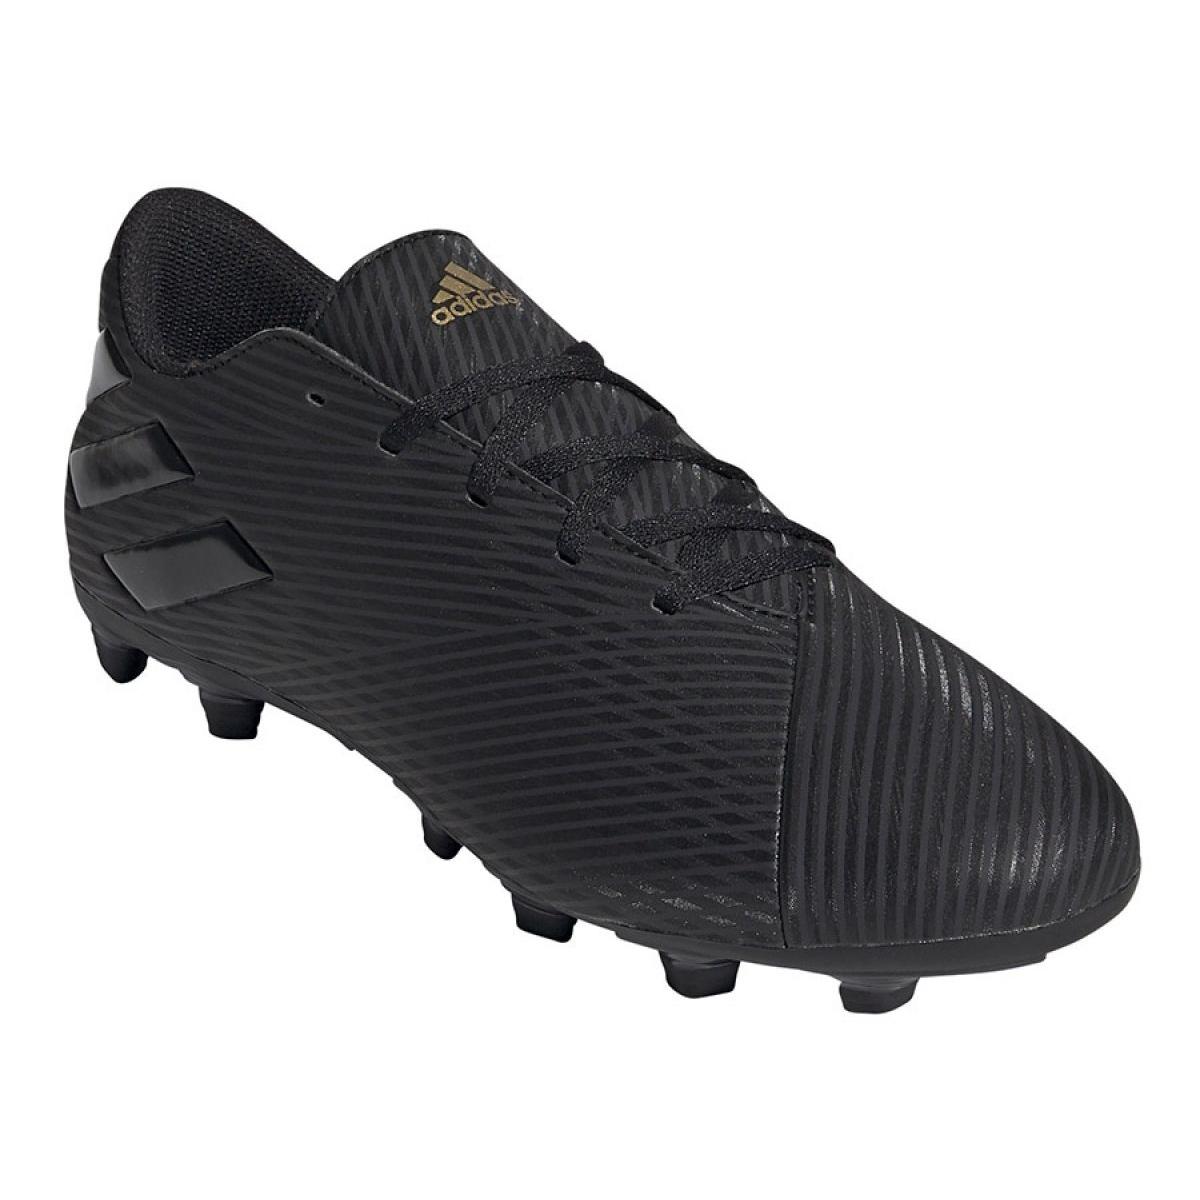 Chaussures de foot adidas Nemeziz 19.4 FxG M F34394